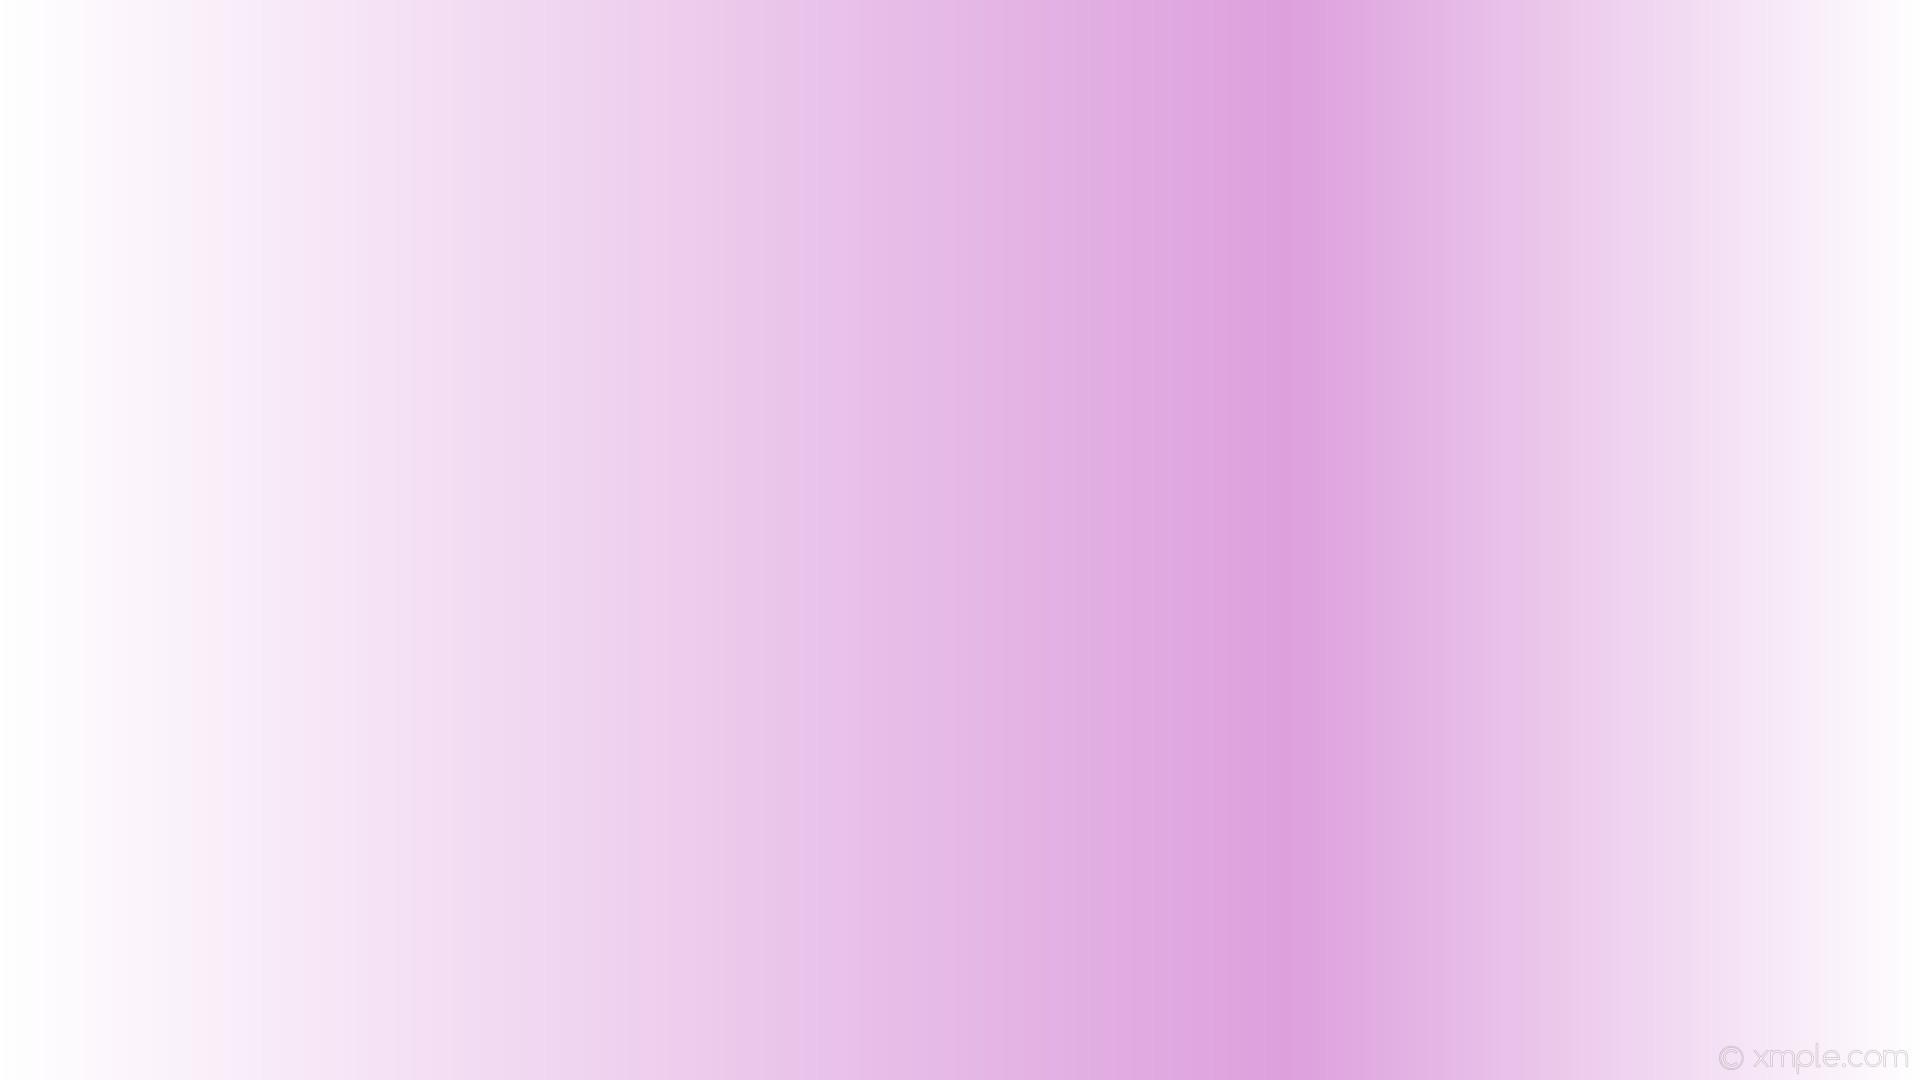 wallpaper purple white gradient highlight linear plum #ffffff #dda0dd 180°  67%